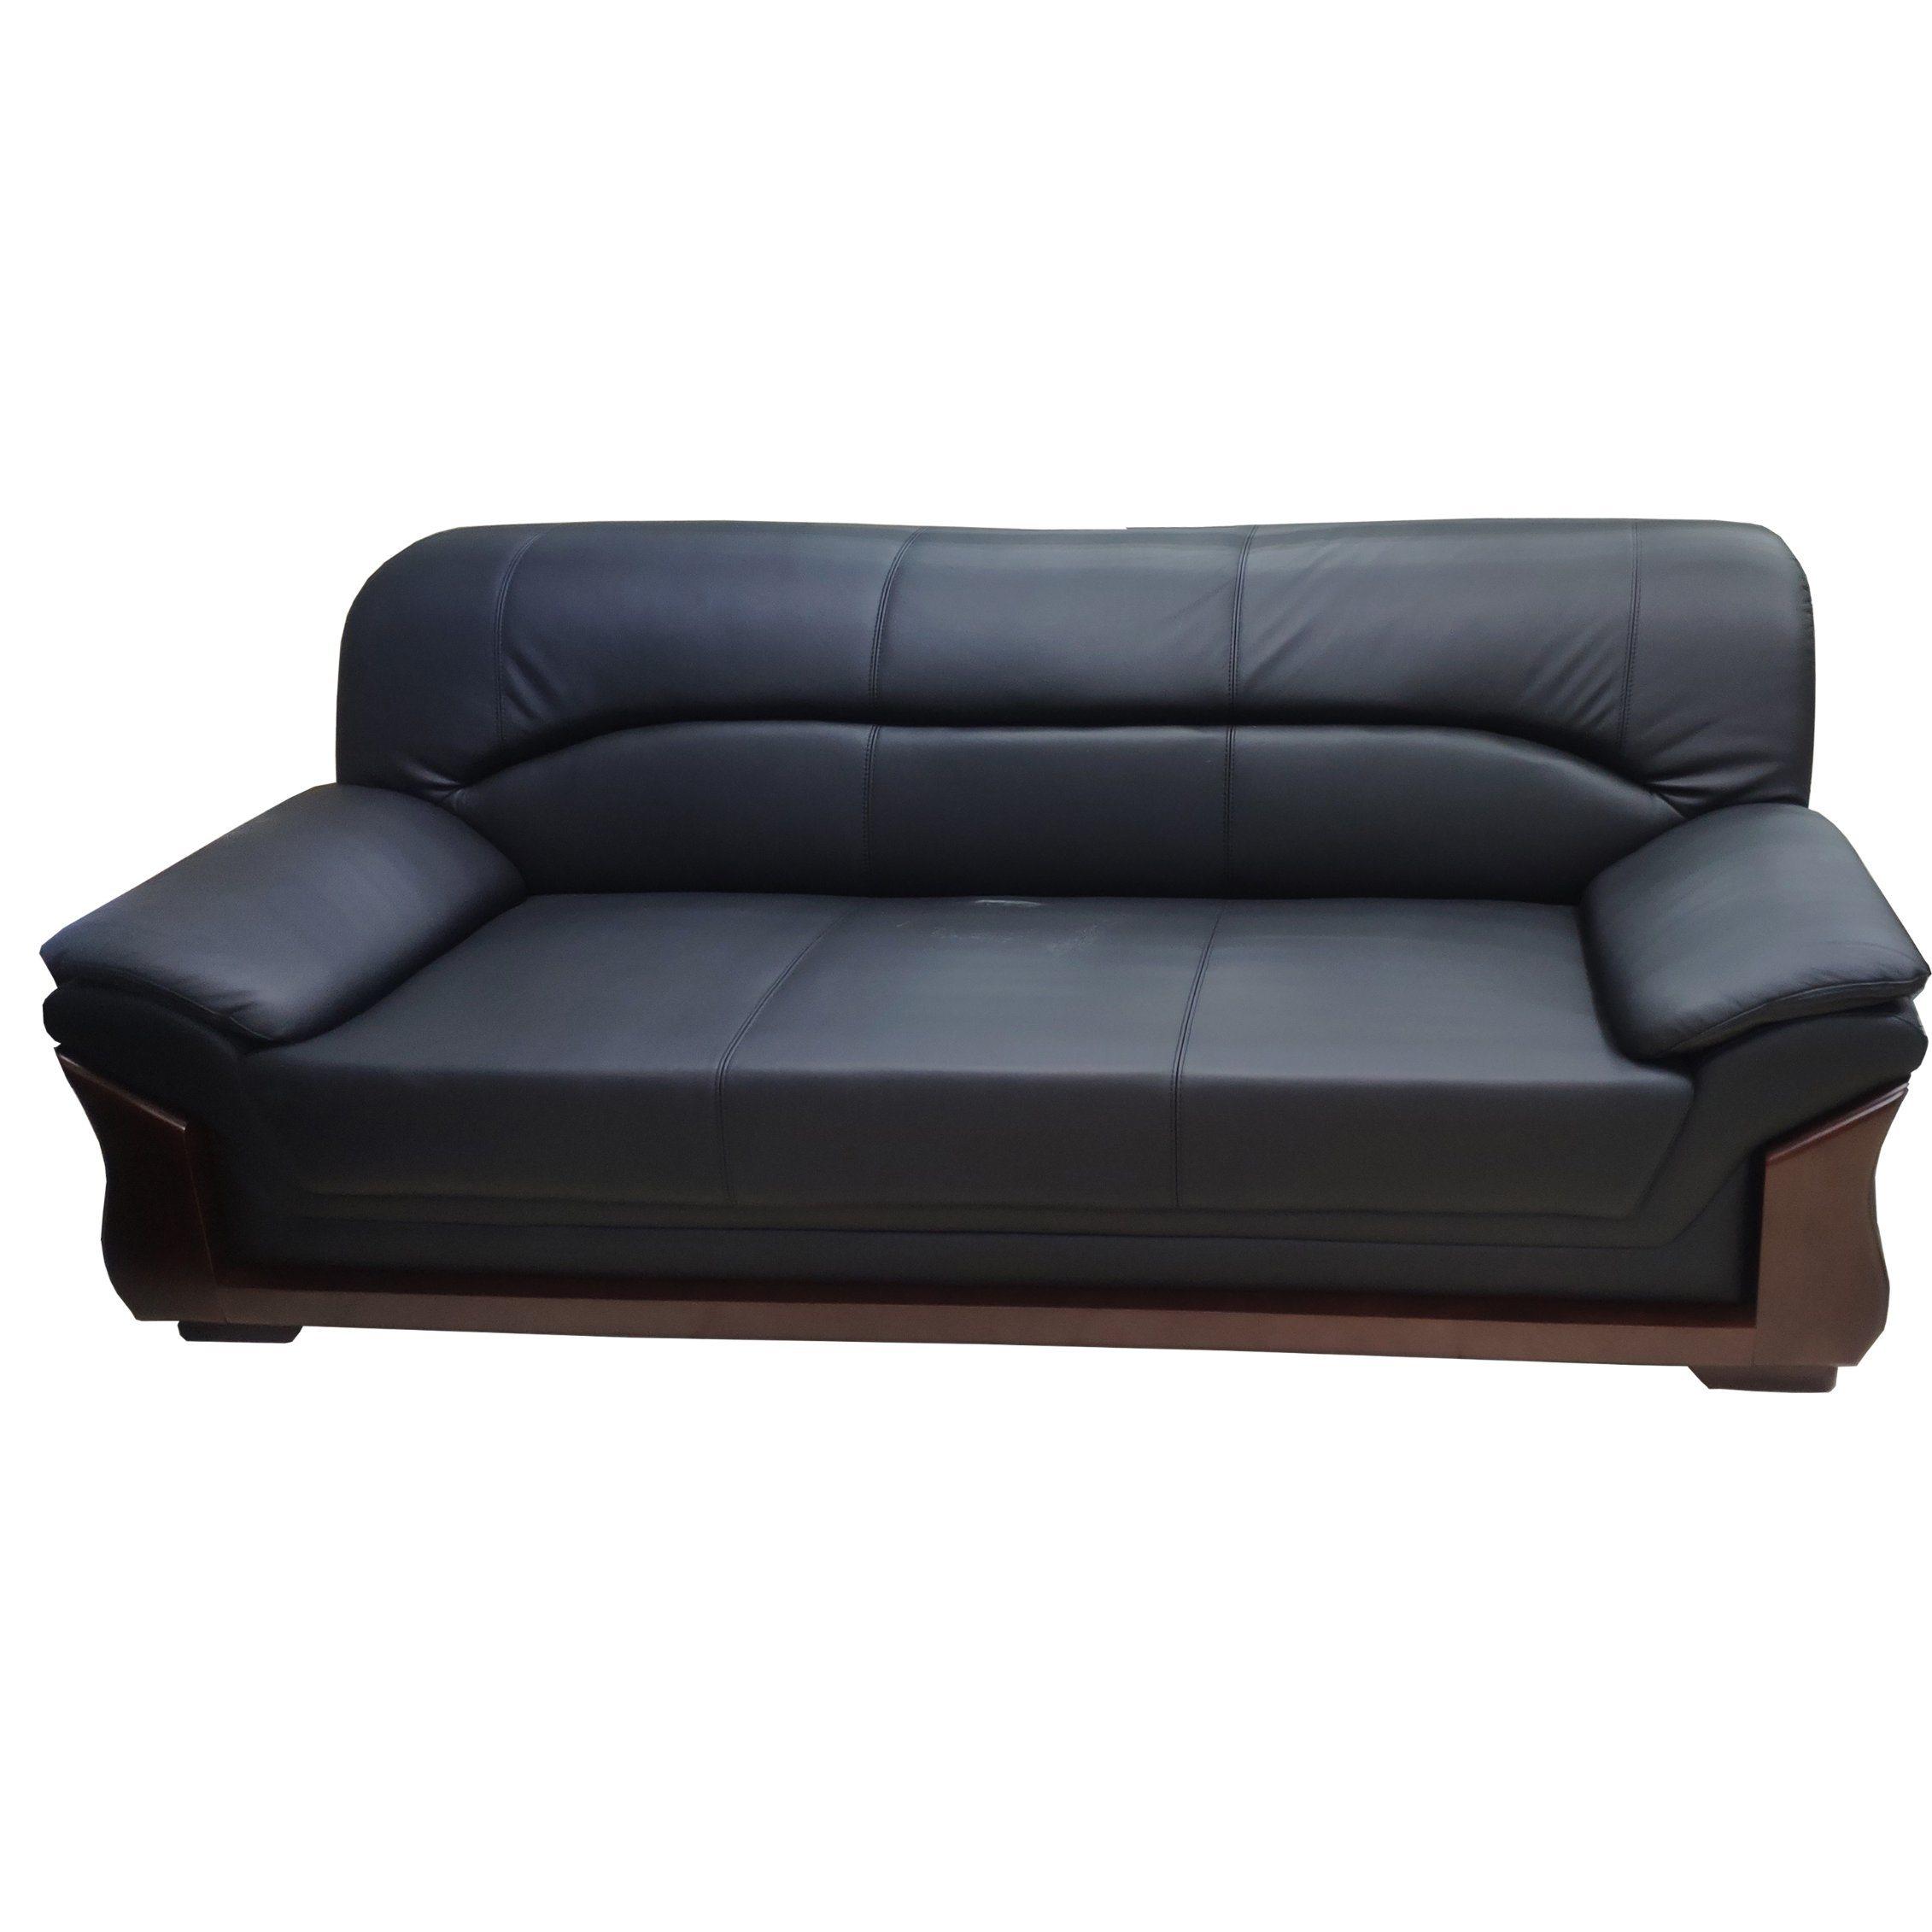 Leather Black Office Furniture Sofa